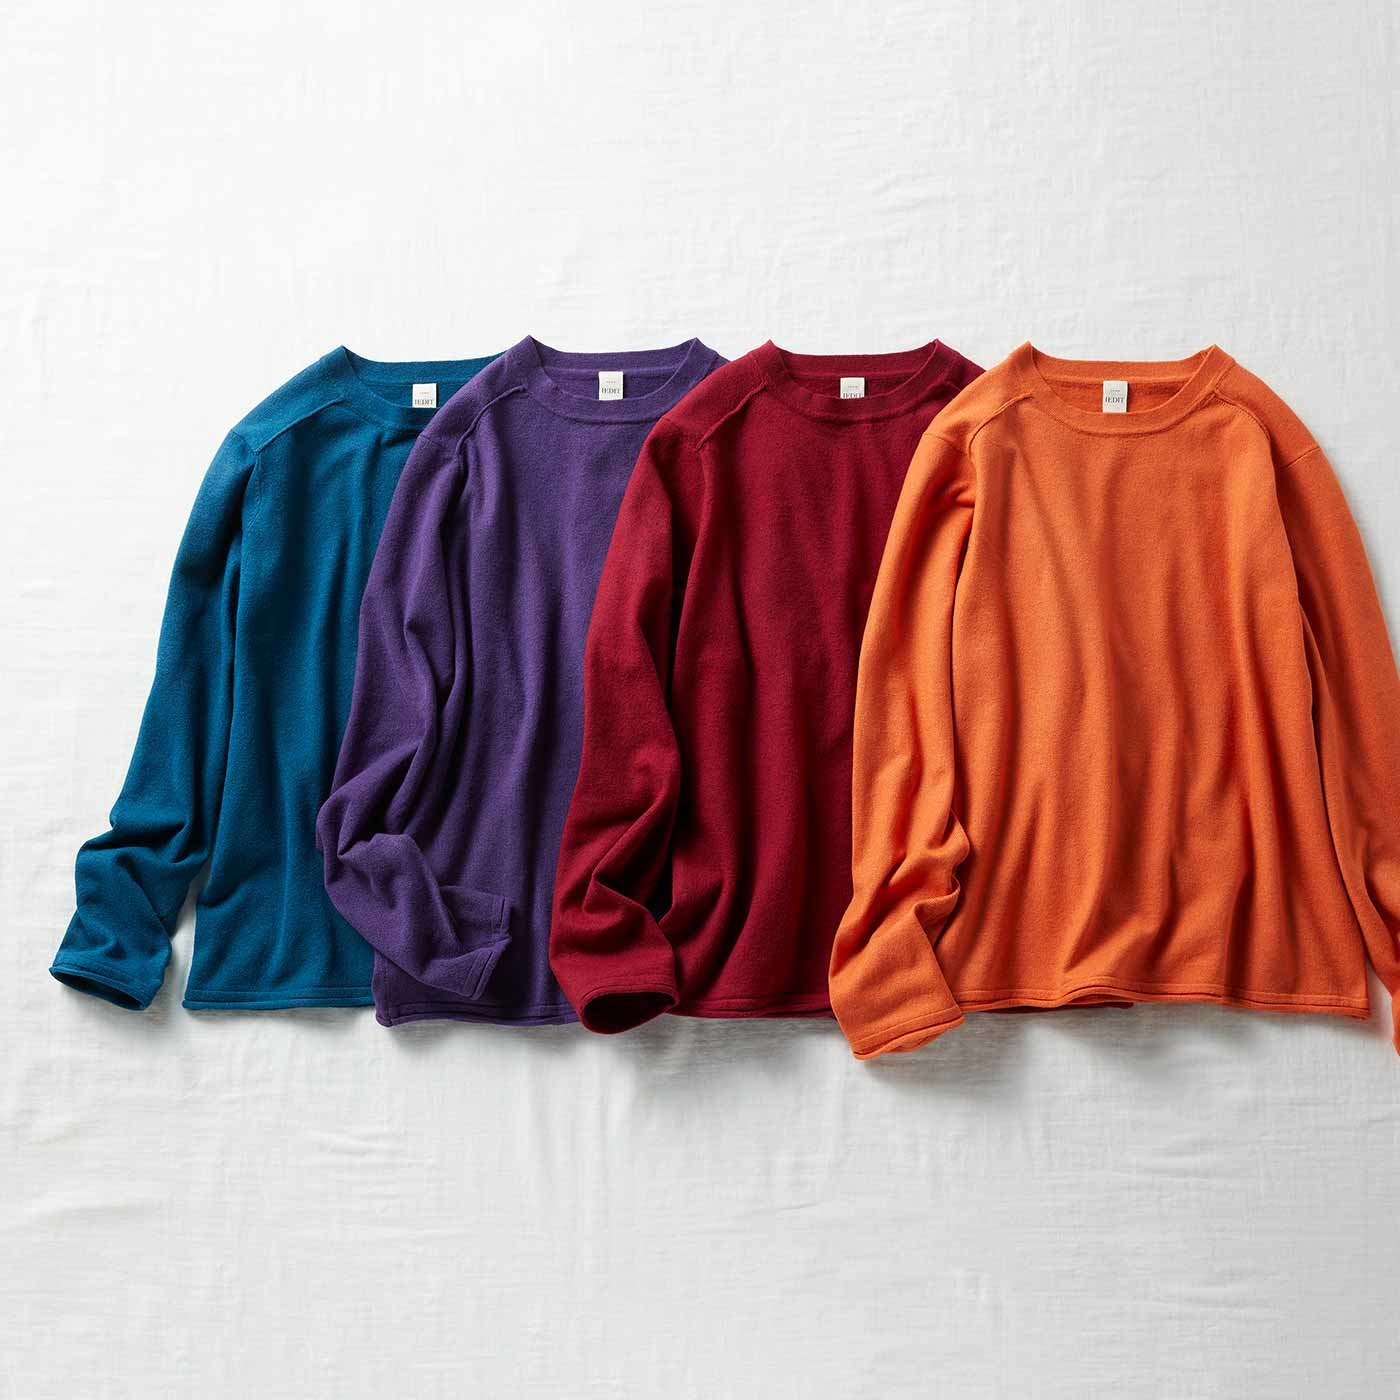 IEDIT[イディット] 着心地伸びやか毎日着たくなる ニットTシャツの会